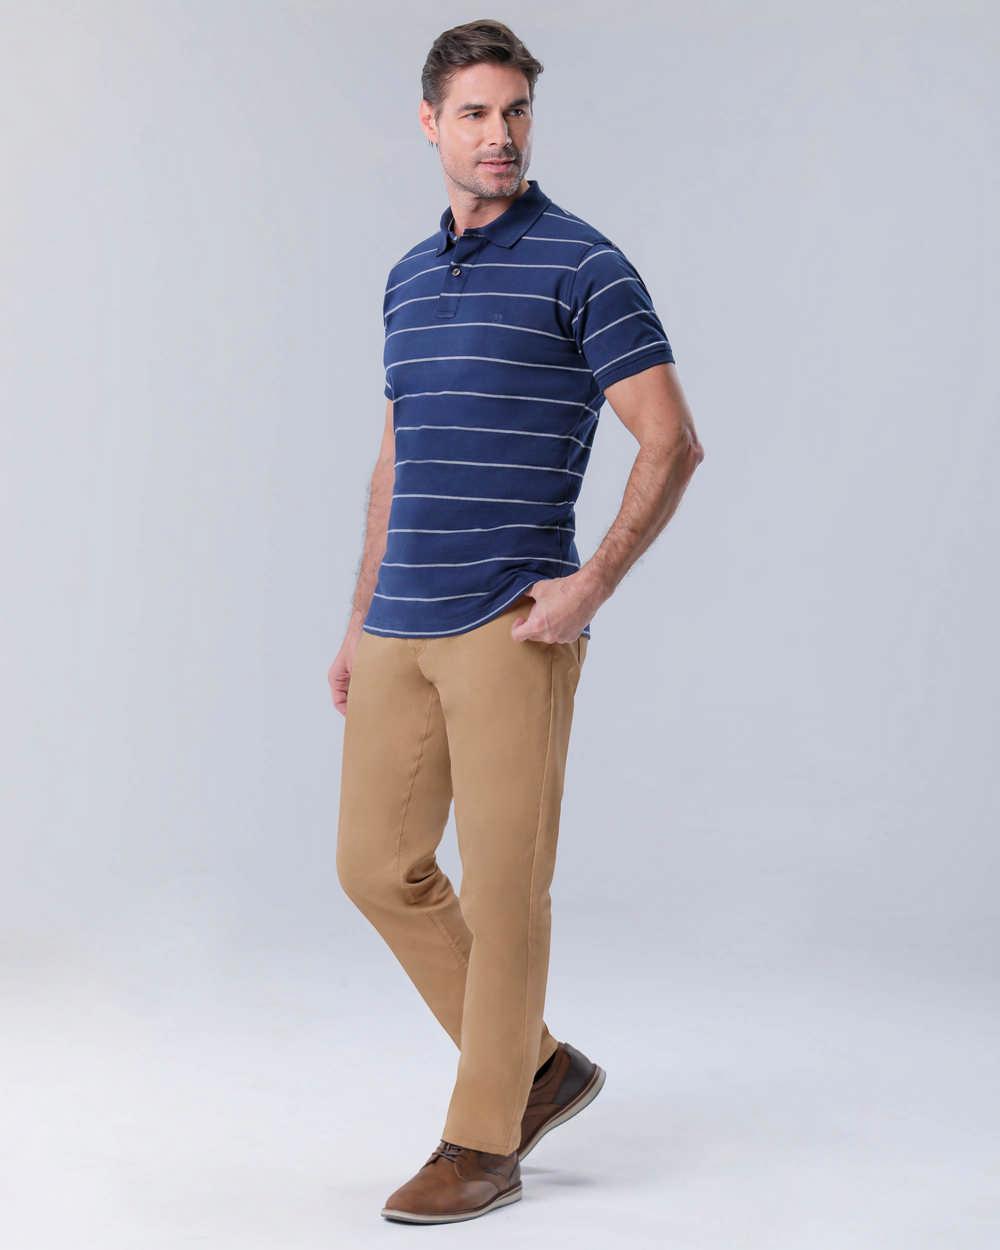 Pantalon manhattan corduroy stretch - Pierre Cardin Costa Rica